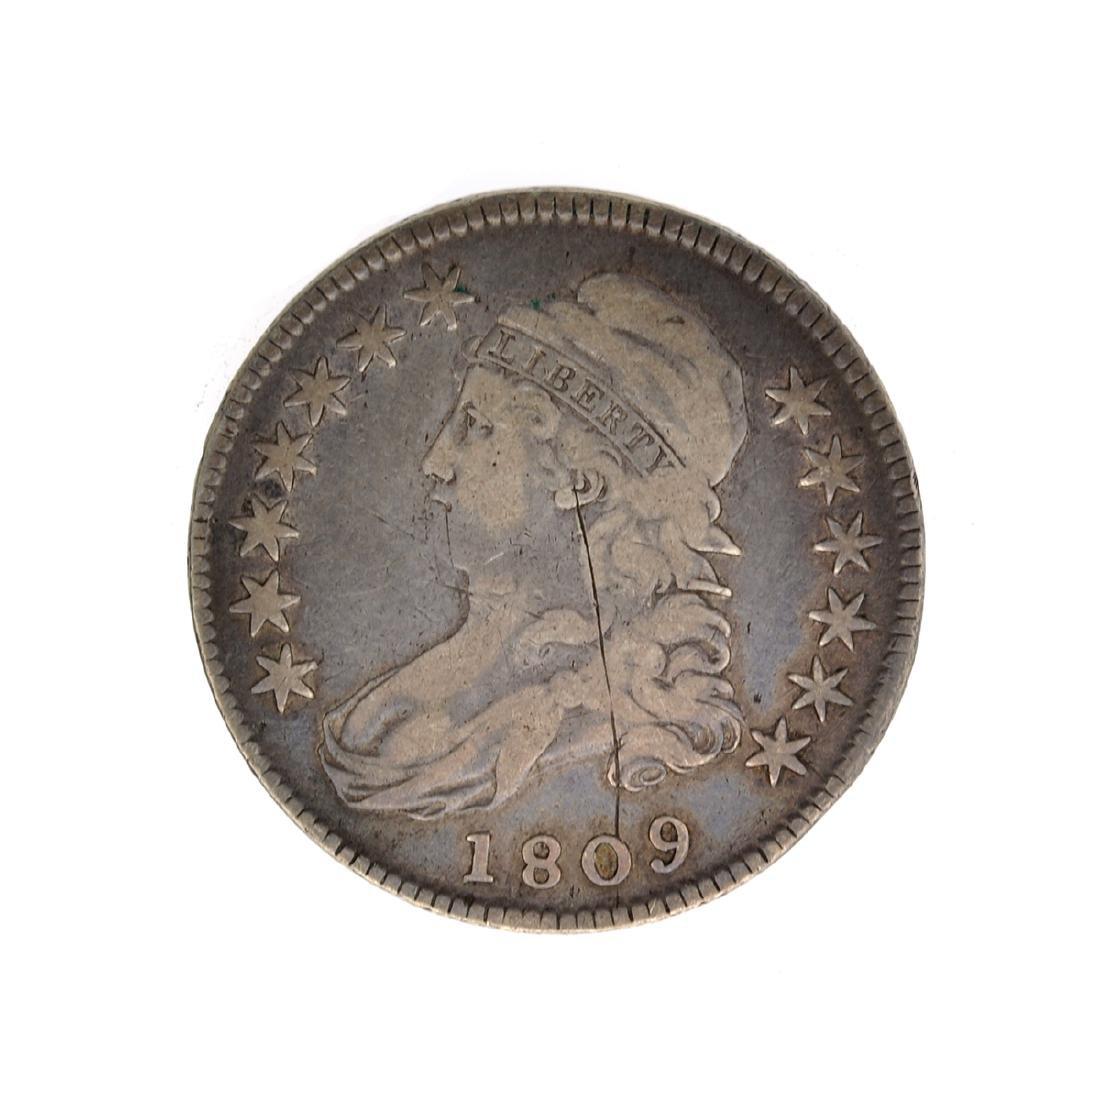 1809 Capped Bust Half Dollar Coin